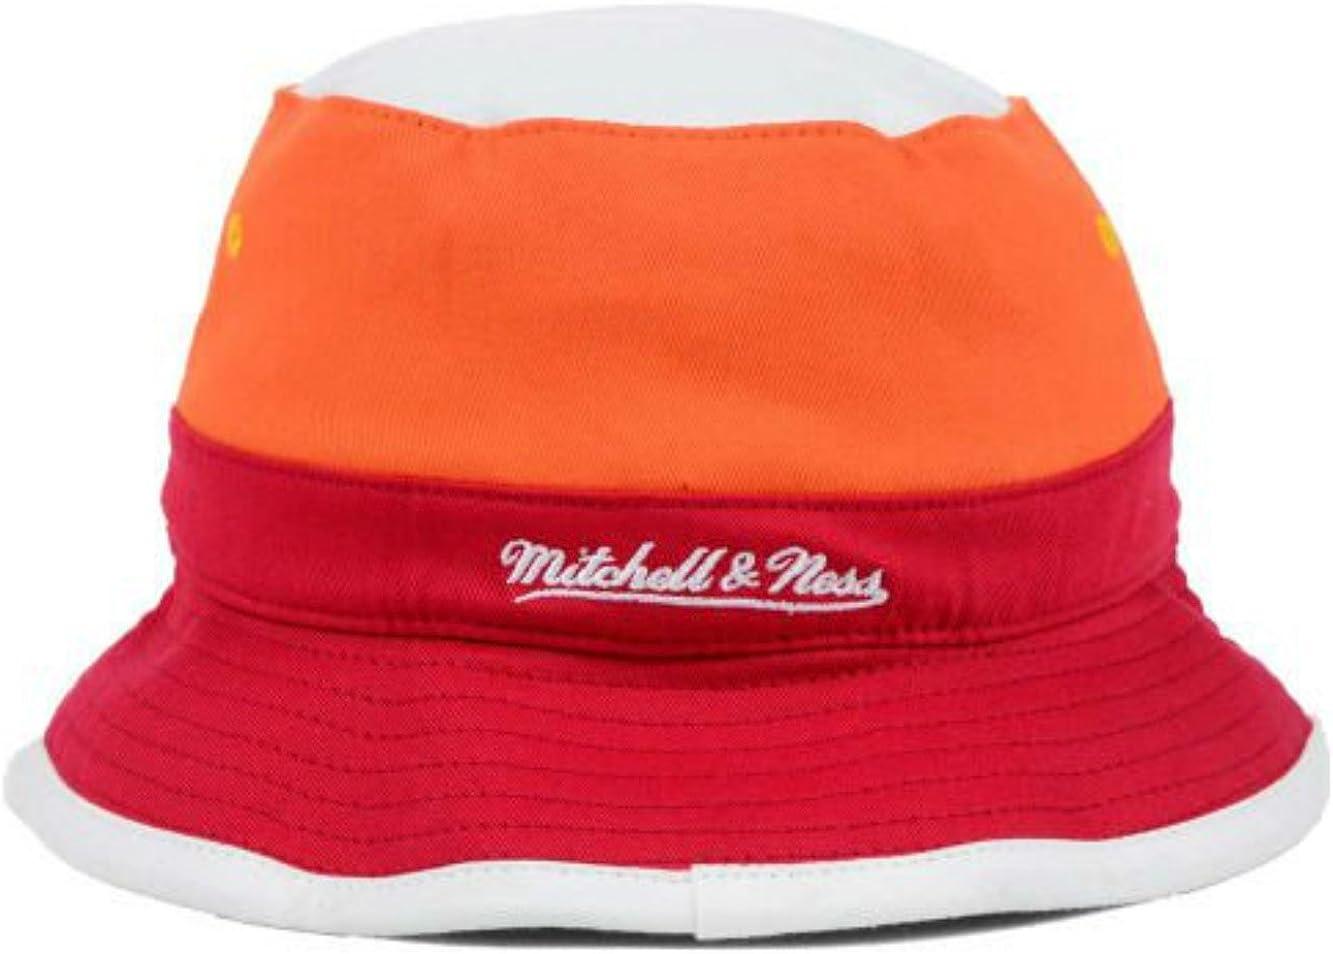 Best Fits 7-7 1//2 Genuine Merchandise Miami Heat Color Block Bucket Hat Cap Small//Medium Team Colors